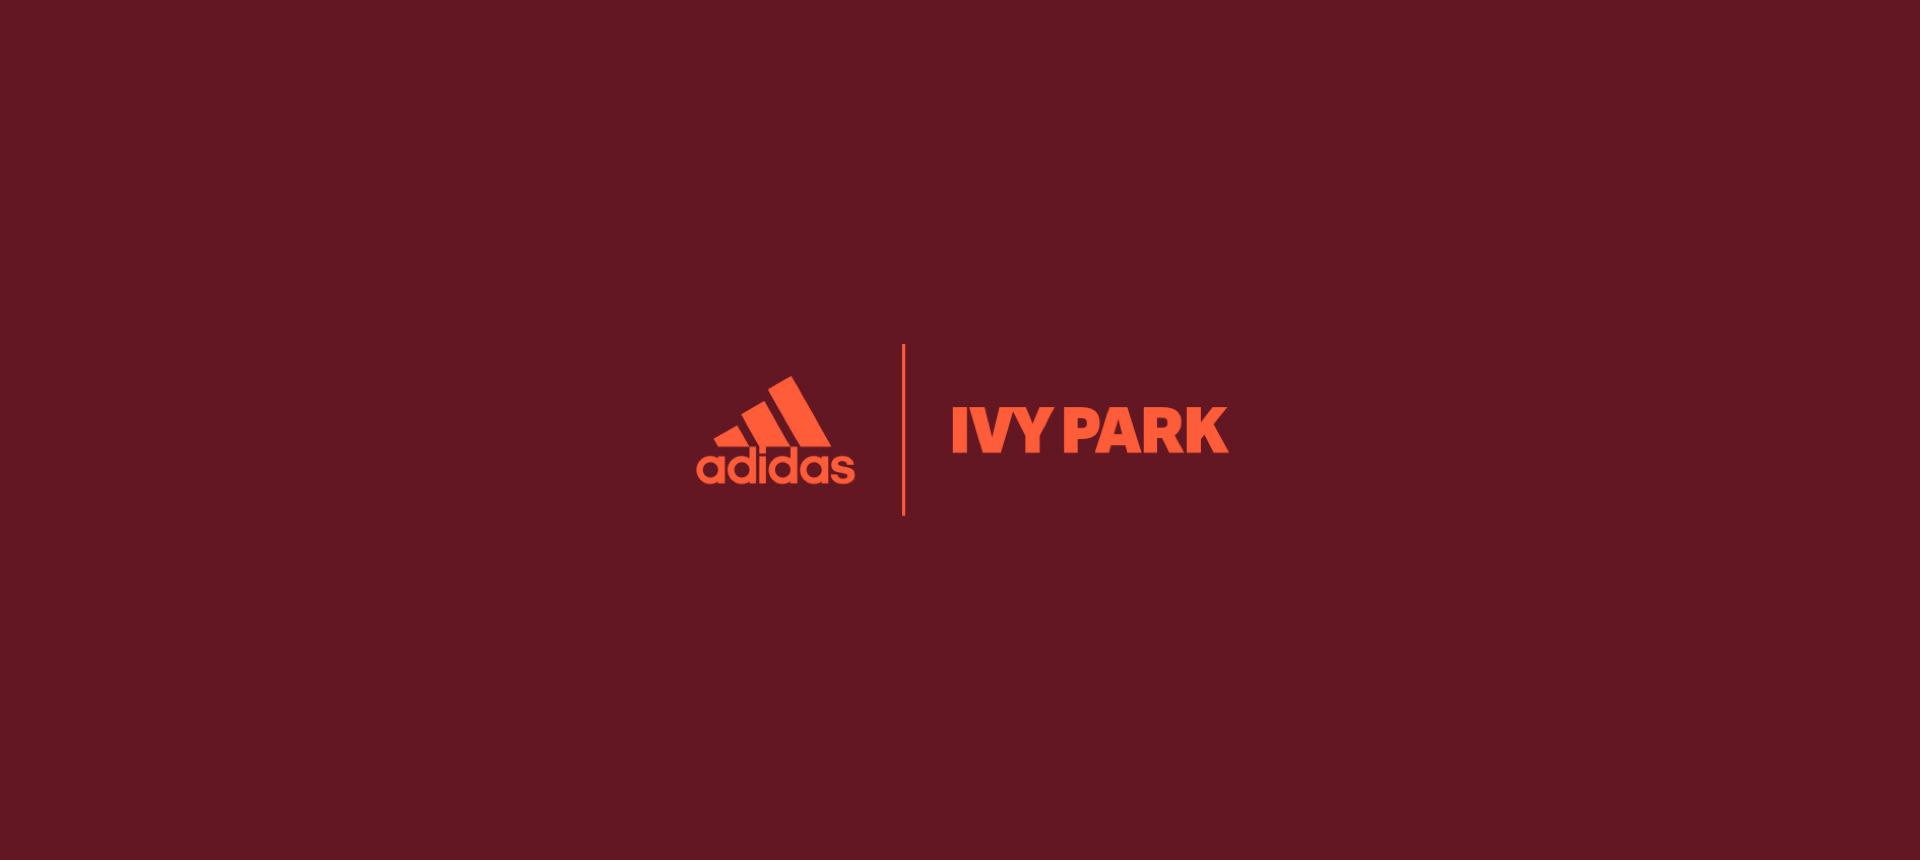 adidas x IVY PARK | adidas PL